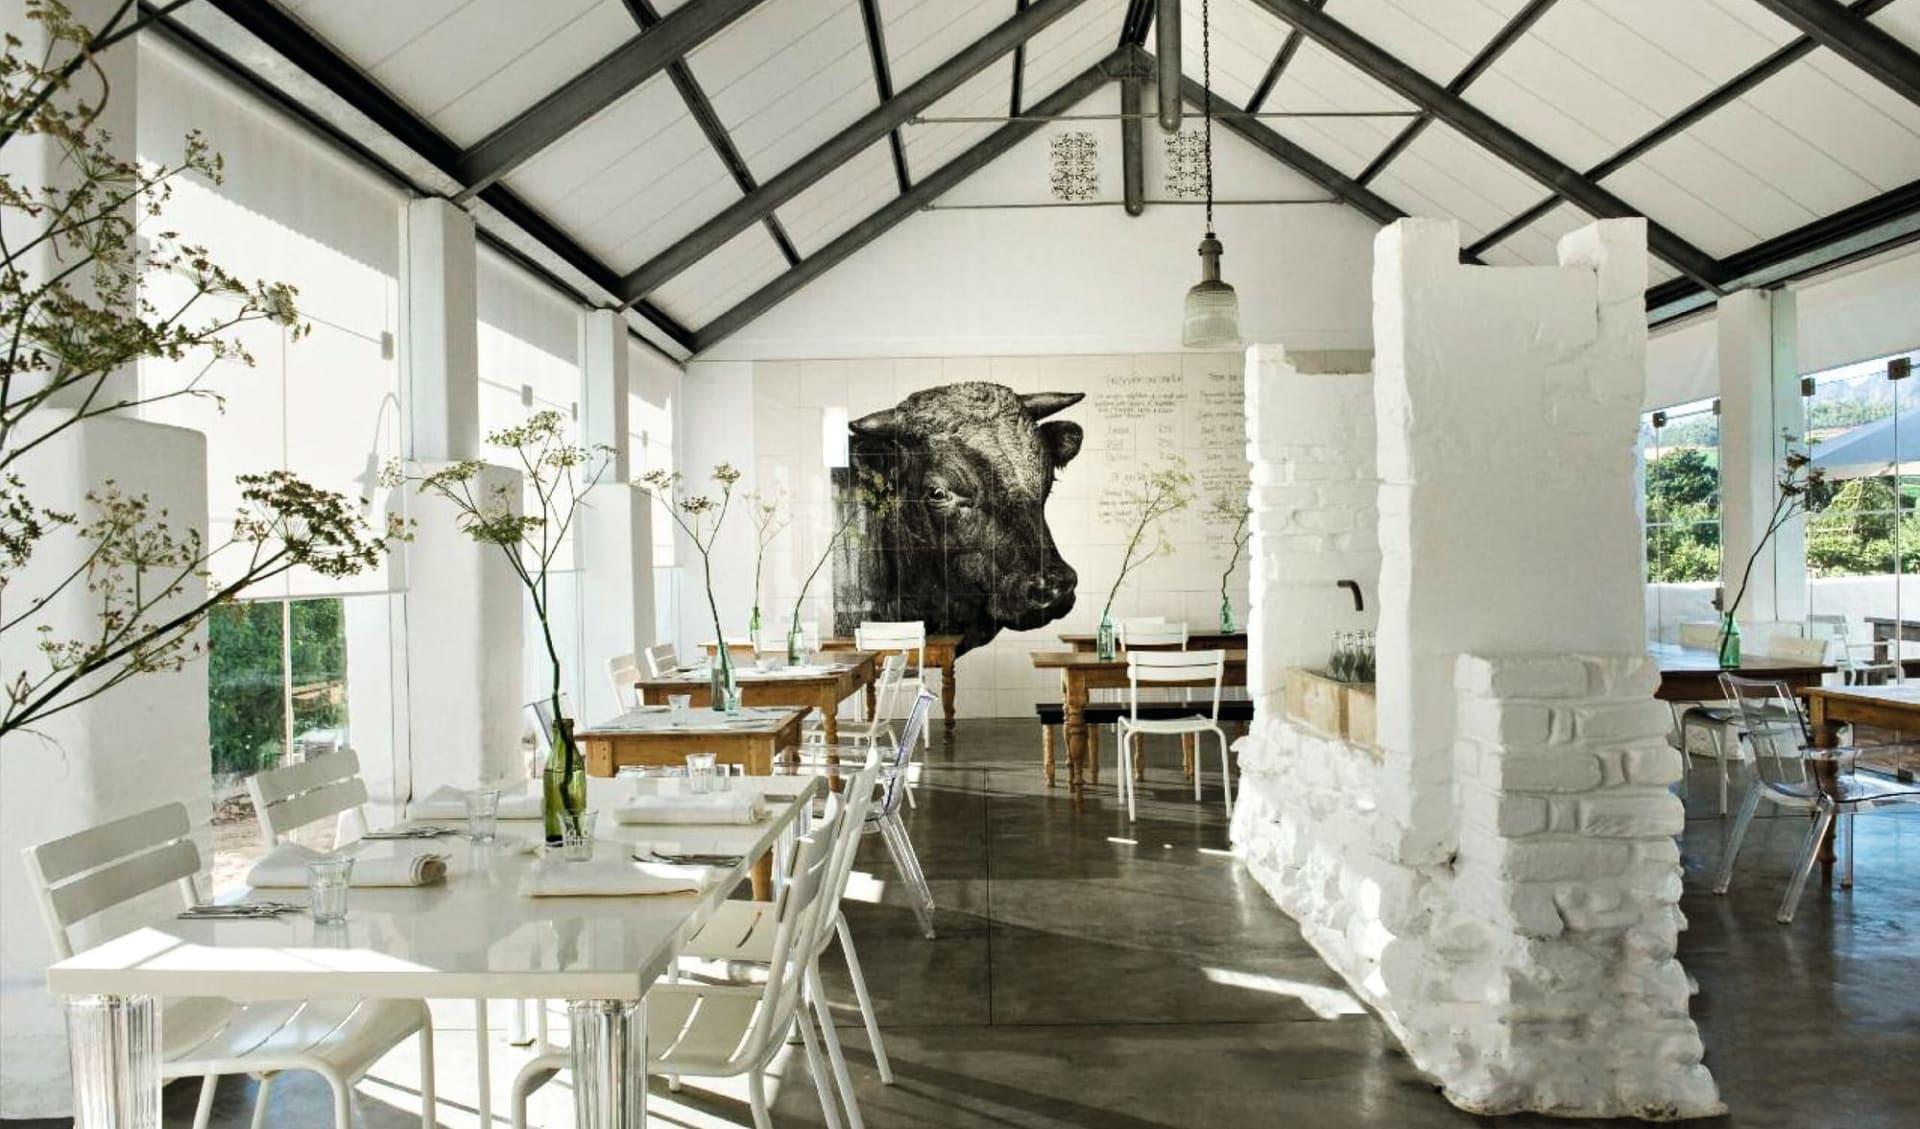 Wonders of South Africa ab Kapstadt: f&b: Babylonstoren Farmhotel - Babel Restaurant